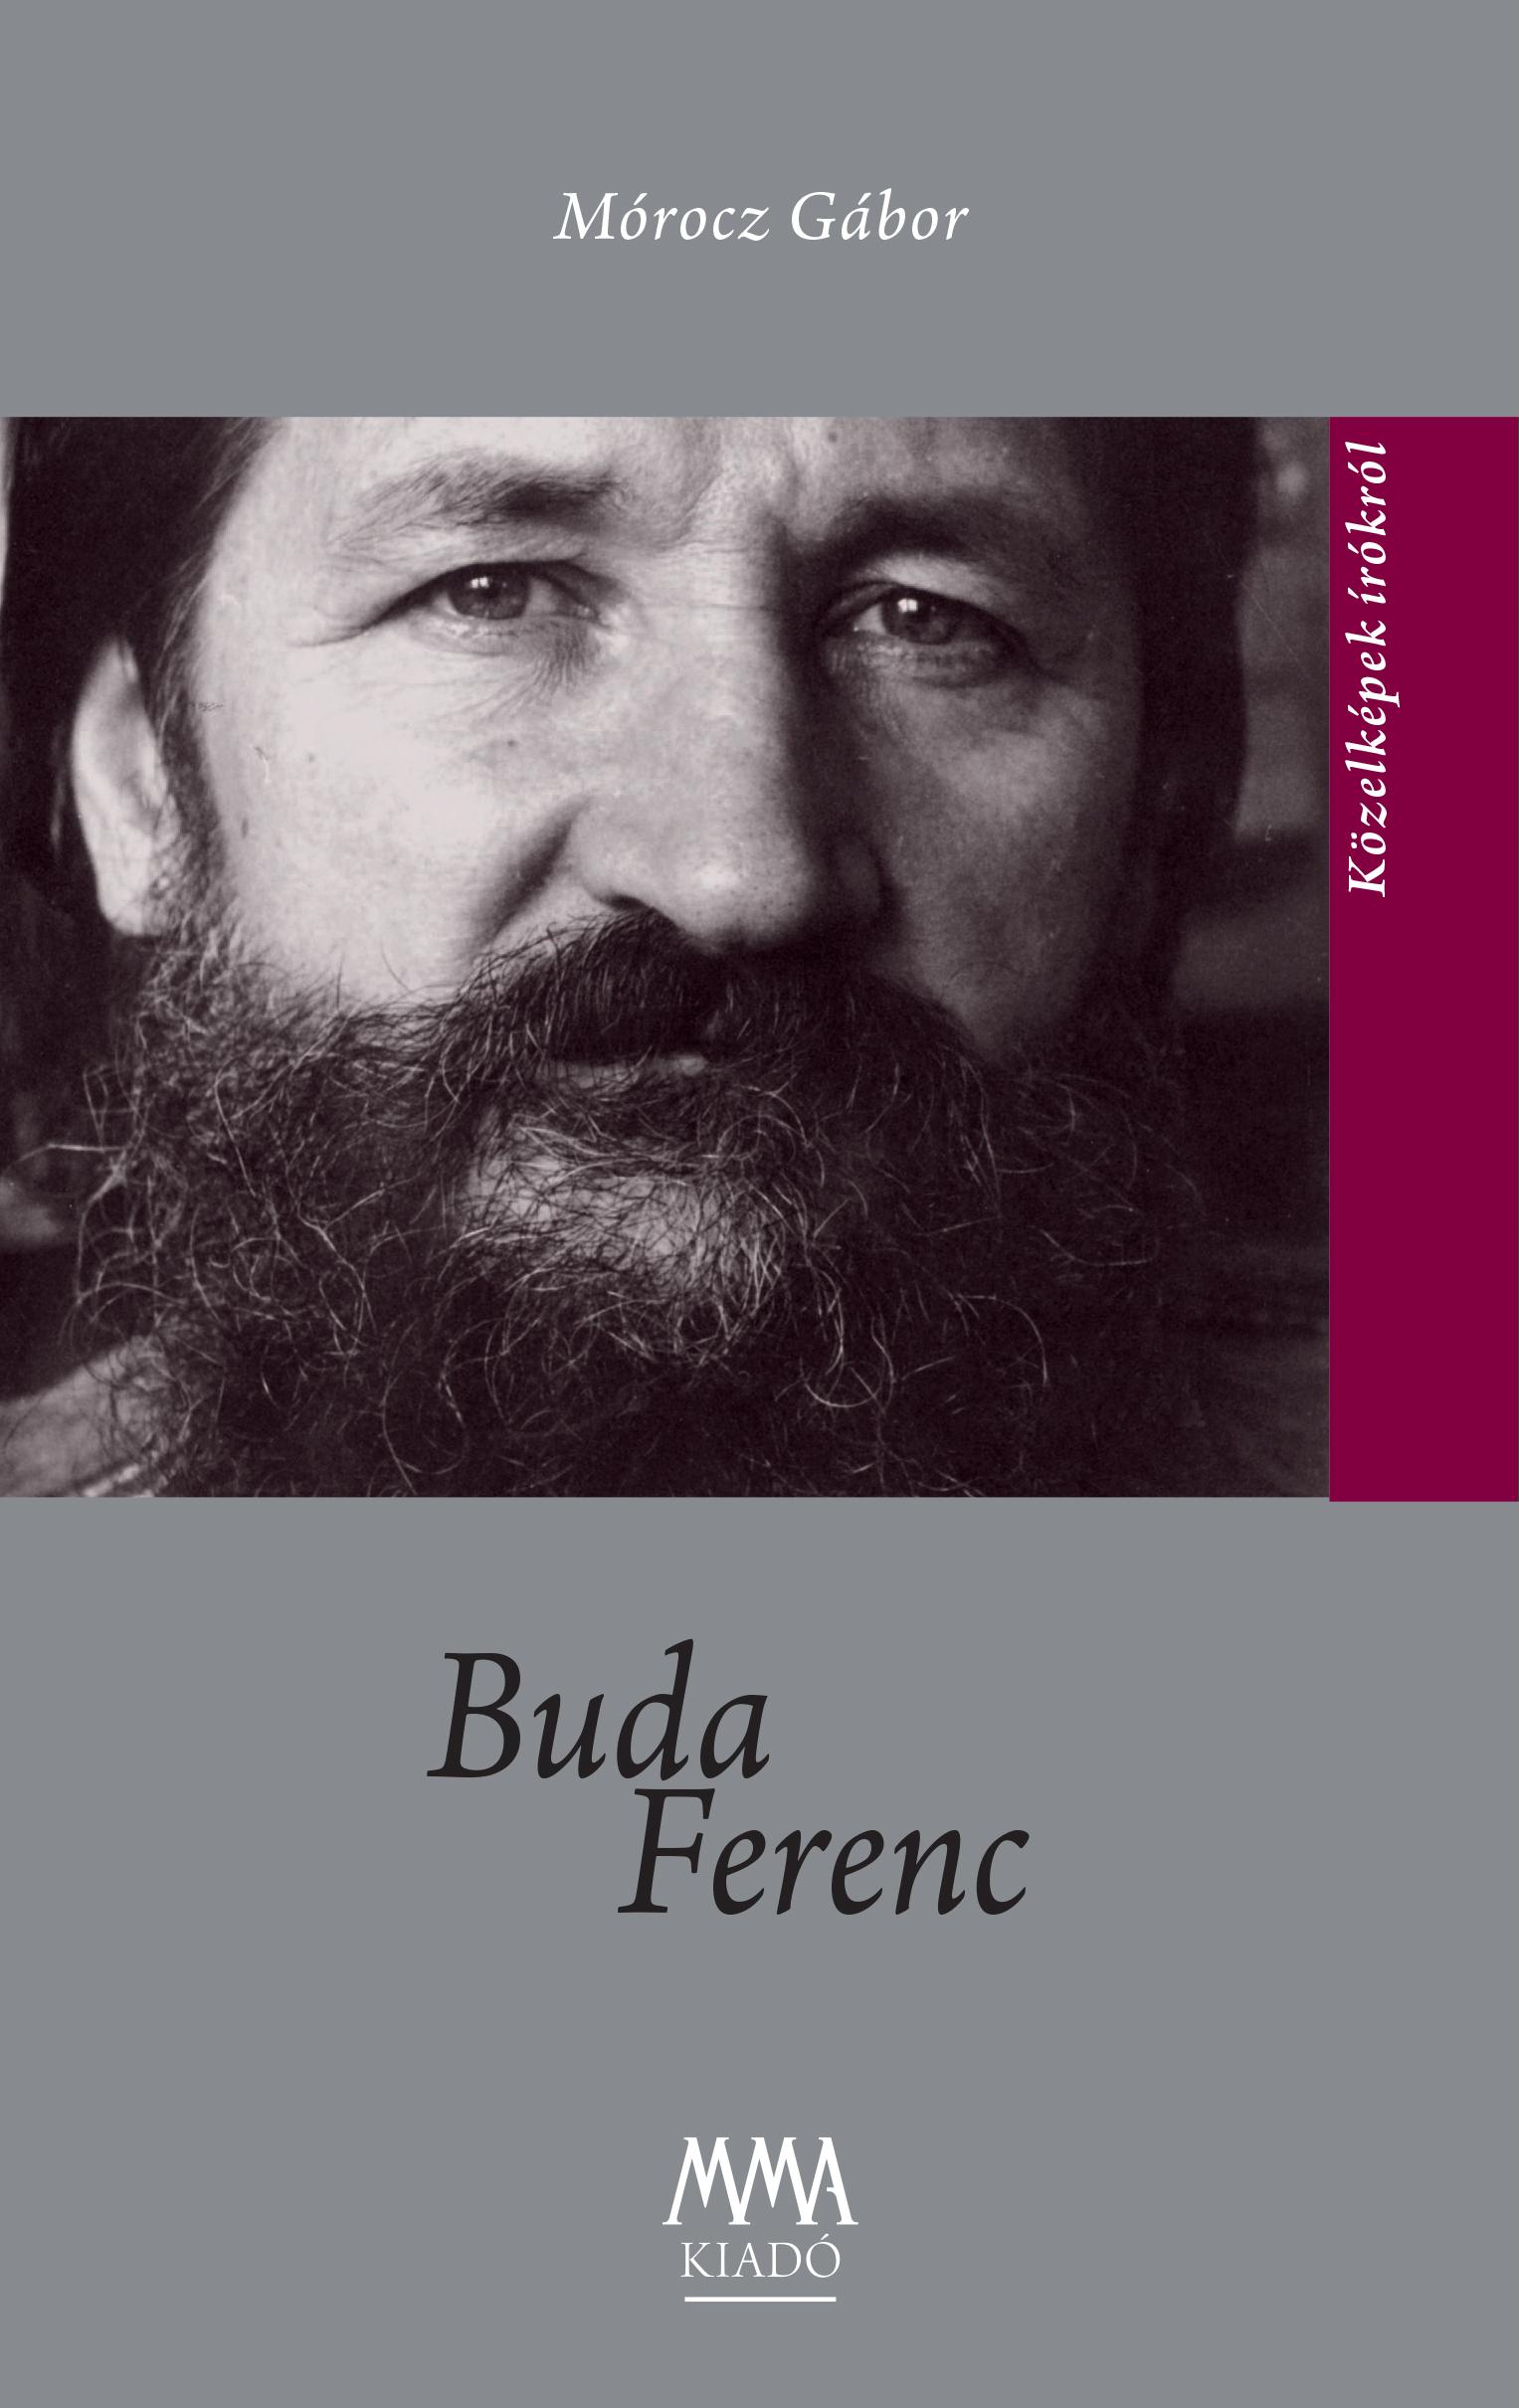 Buda Ferenc